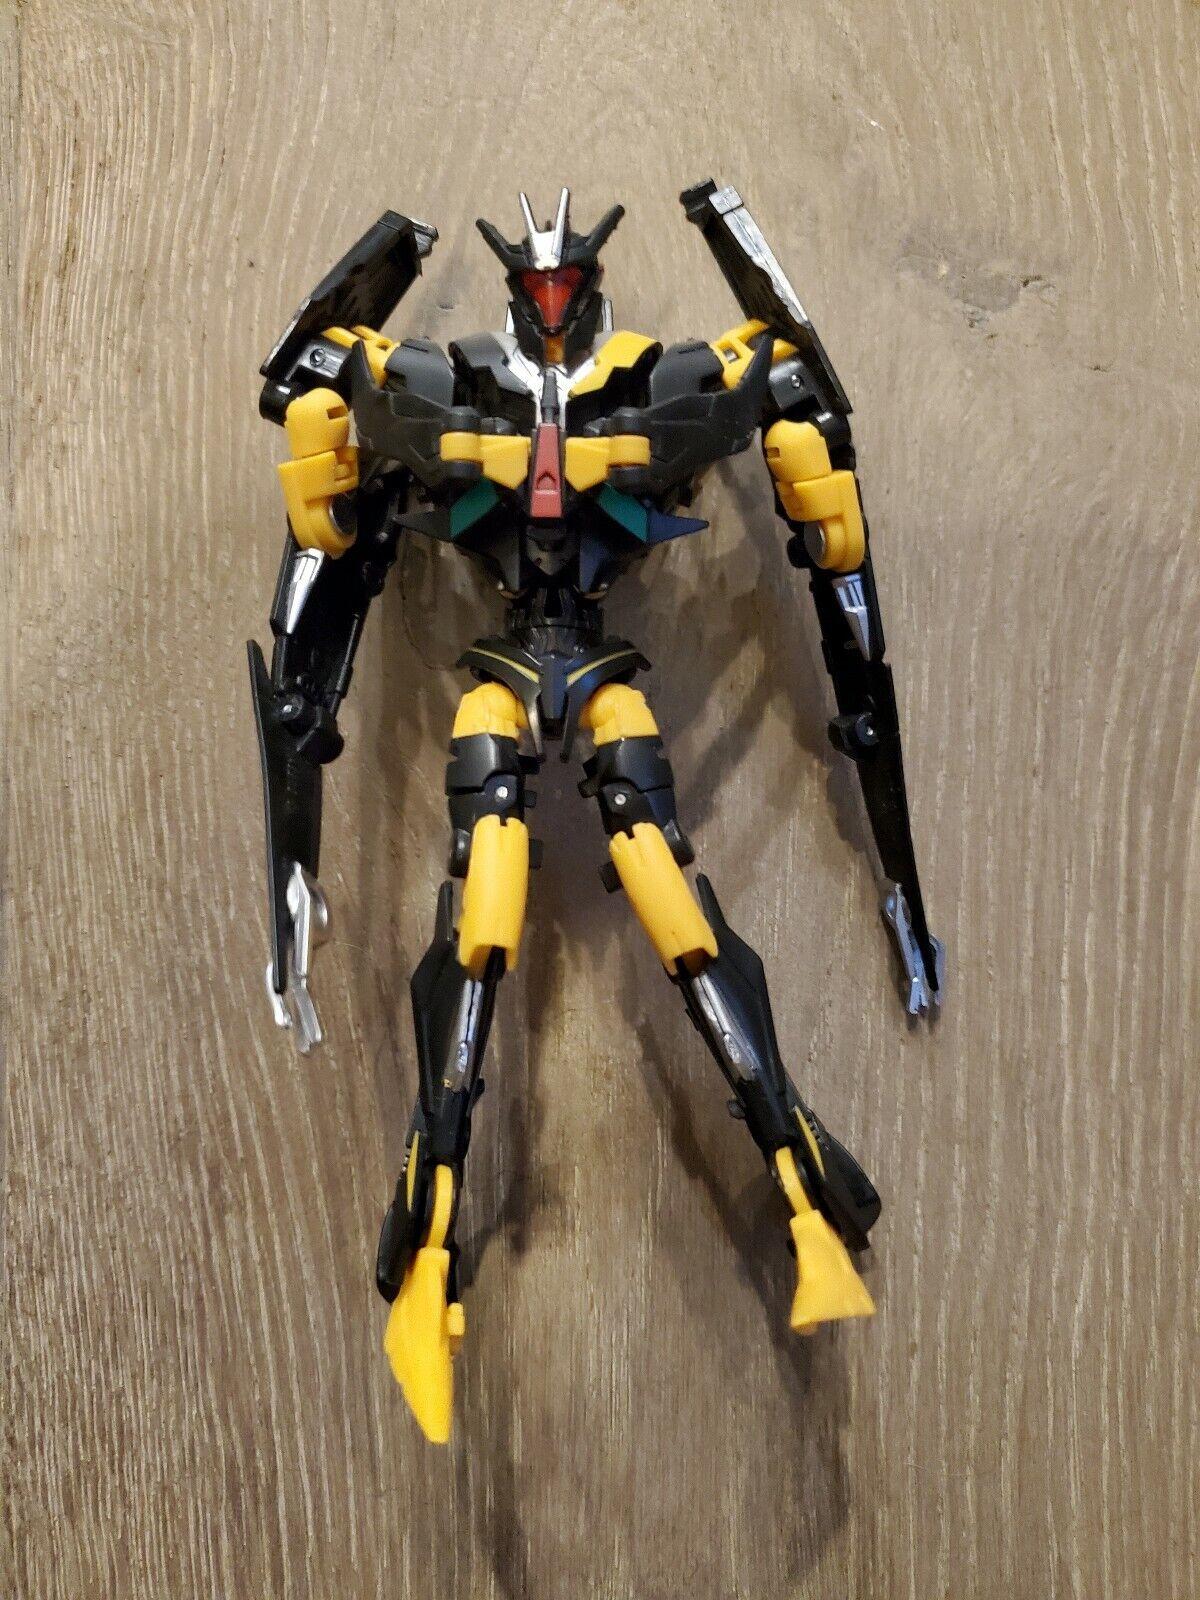 Hasbro transformers vs gi joe gijoe Stealth bat b.a.t. drone soundwave club tfcc